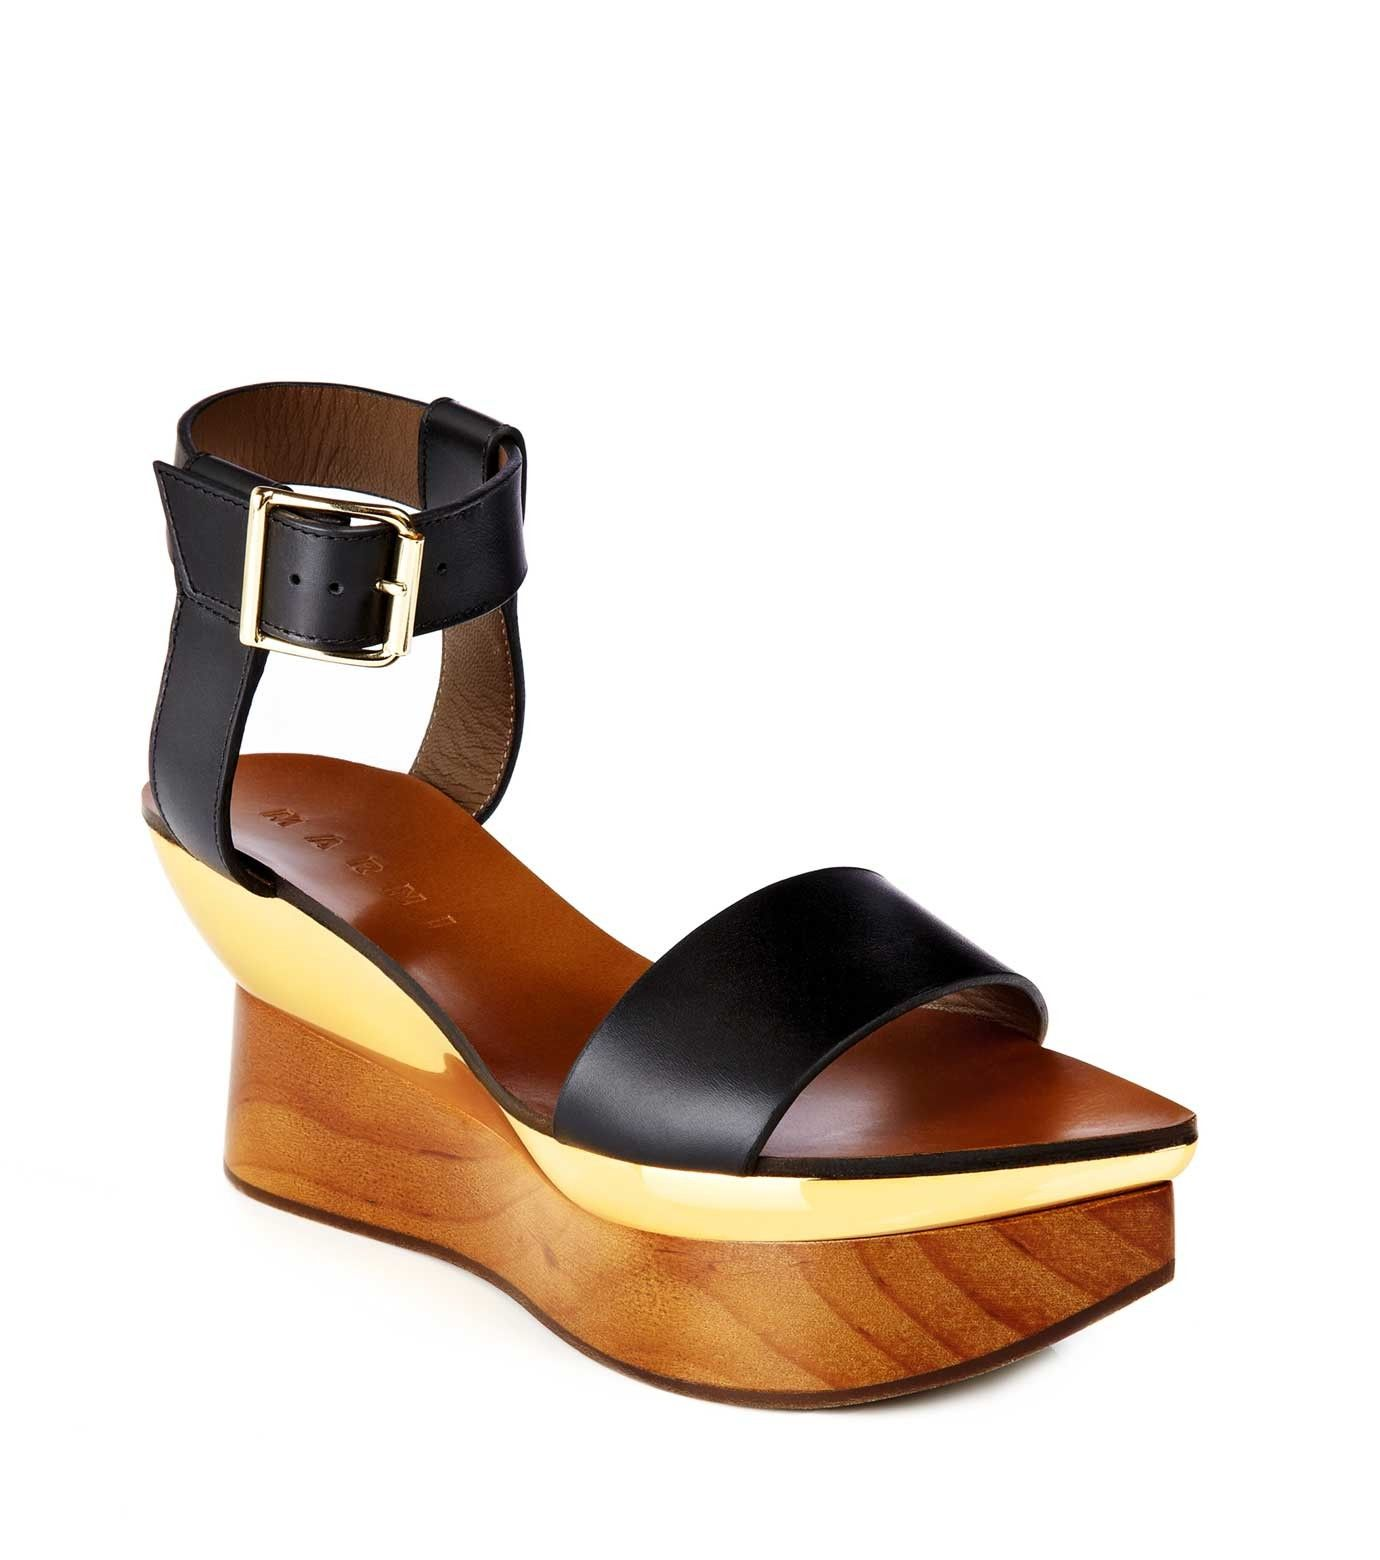 Marni curved sole wedge